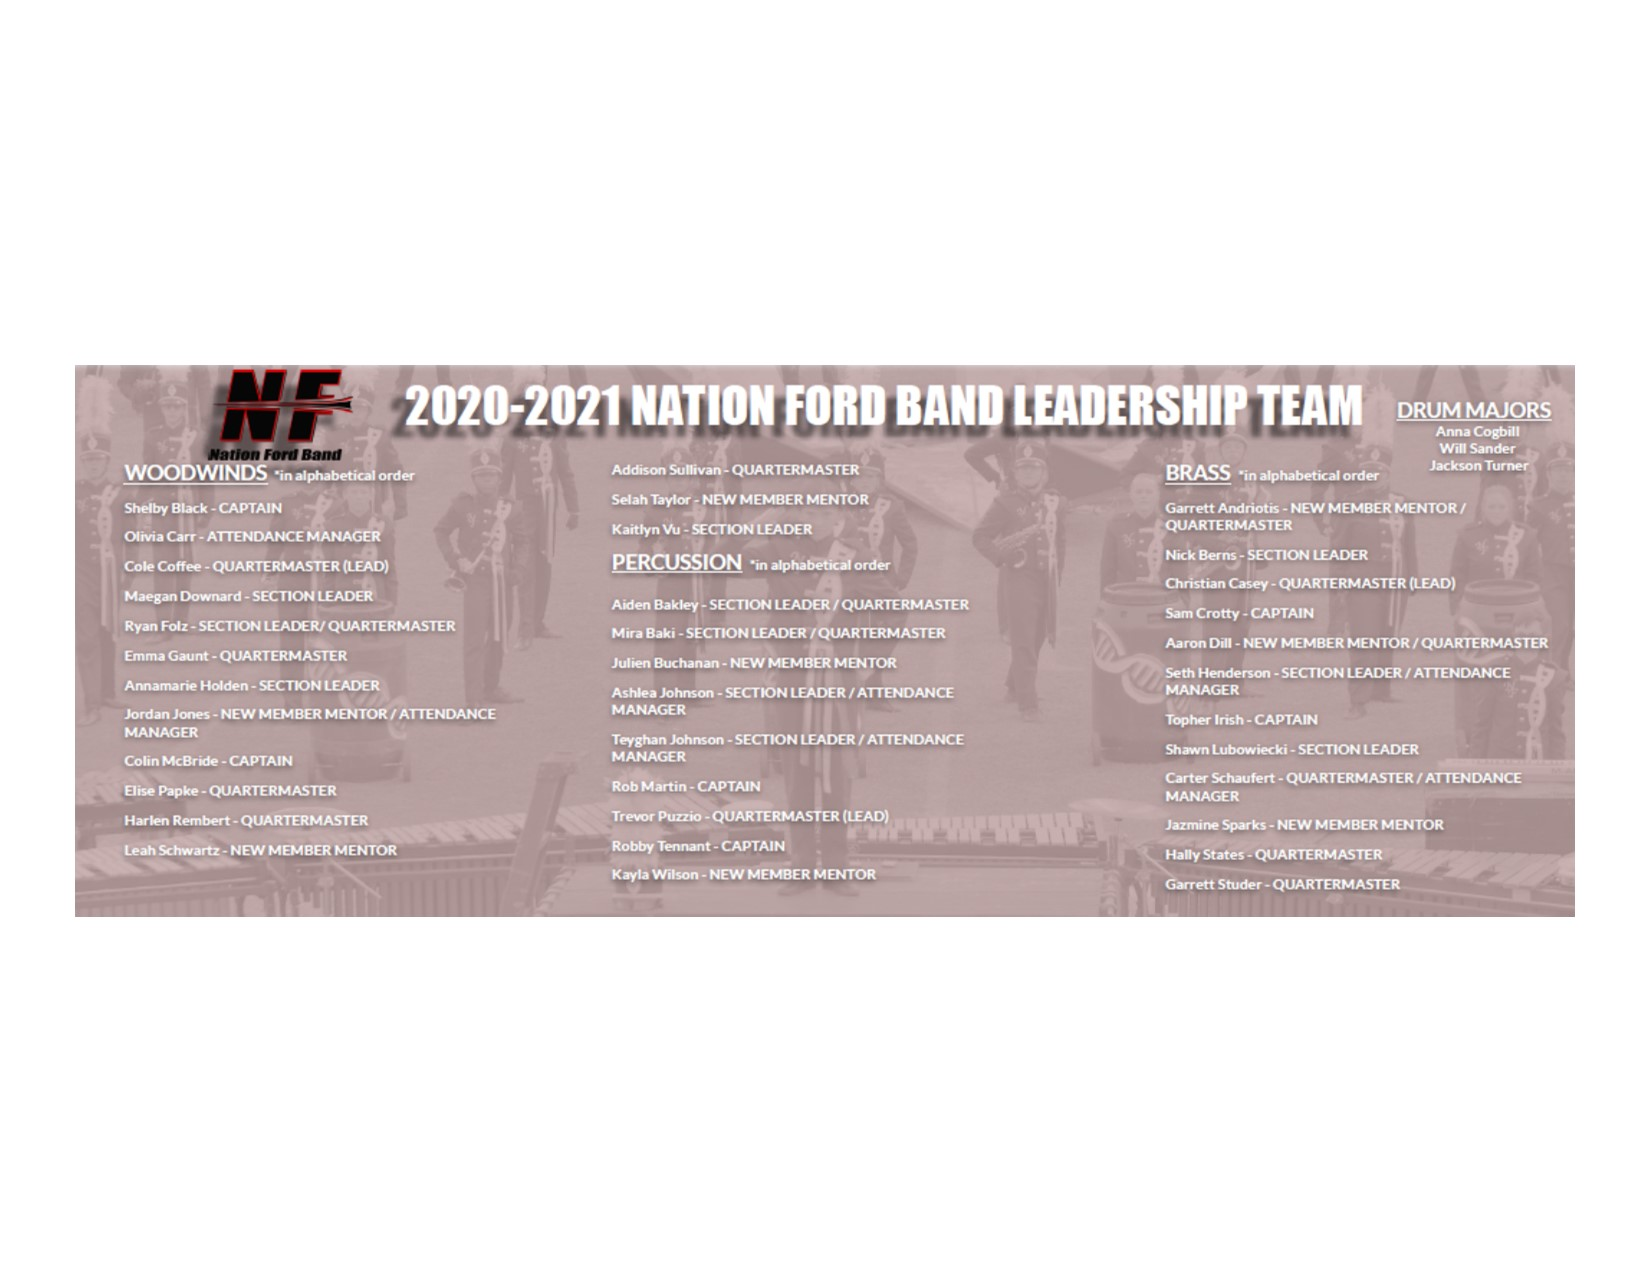 20 21 leadership